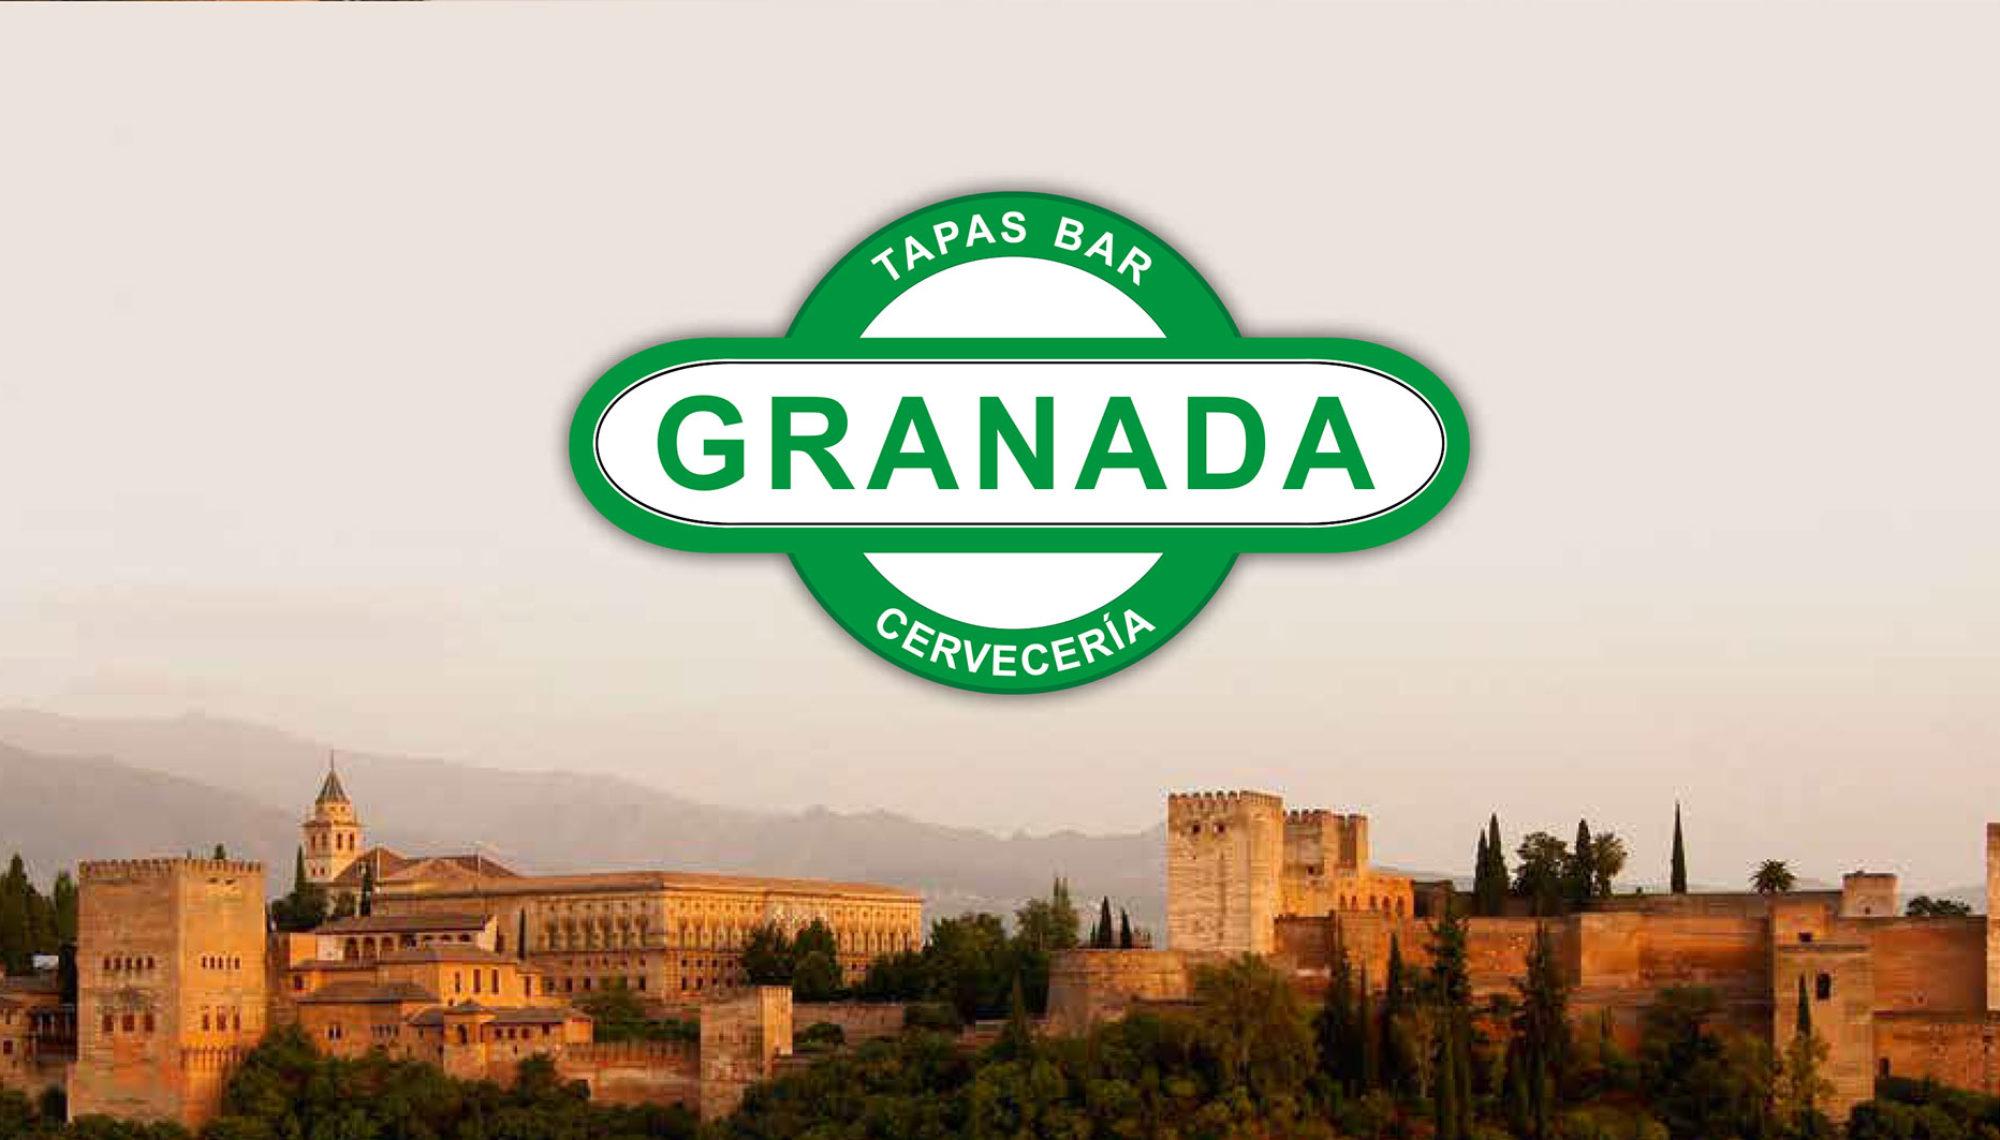 Tapas-Bar Granada in Paderborn